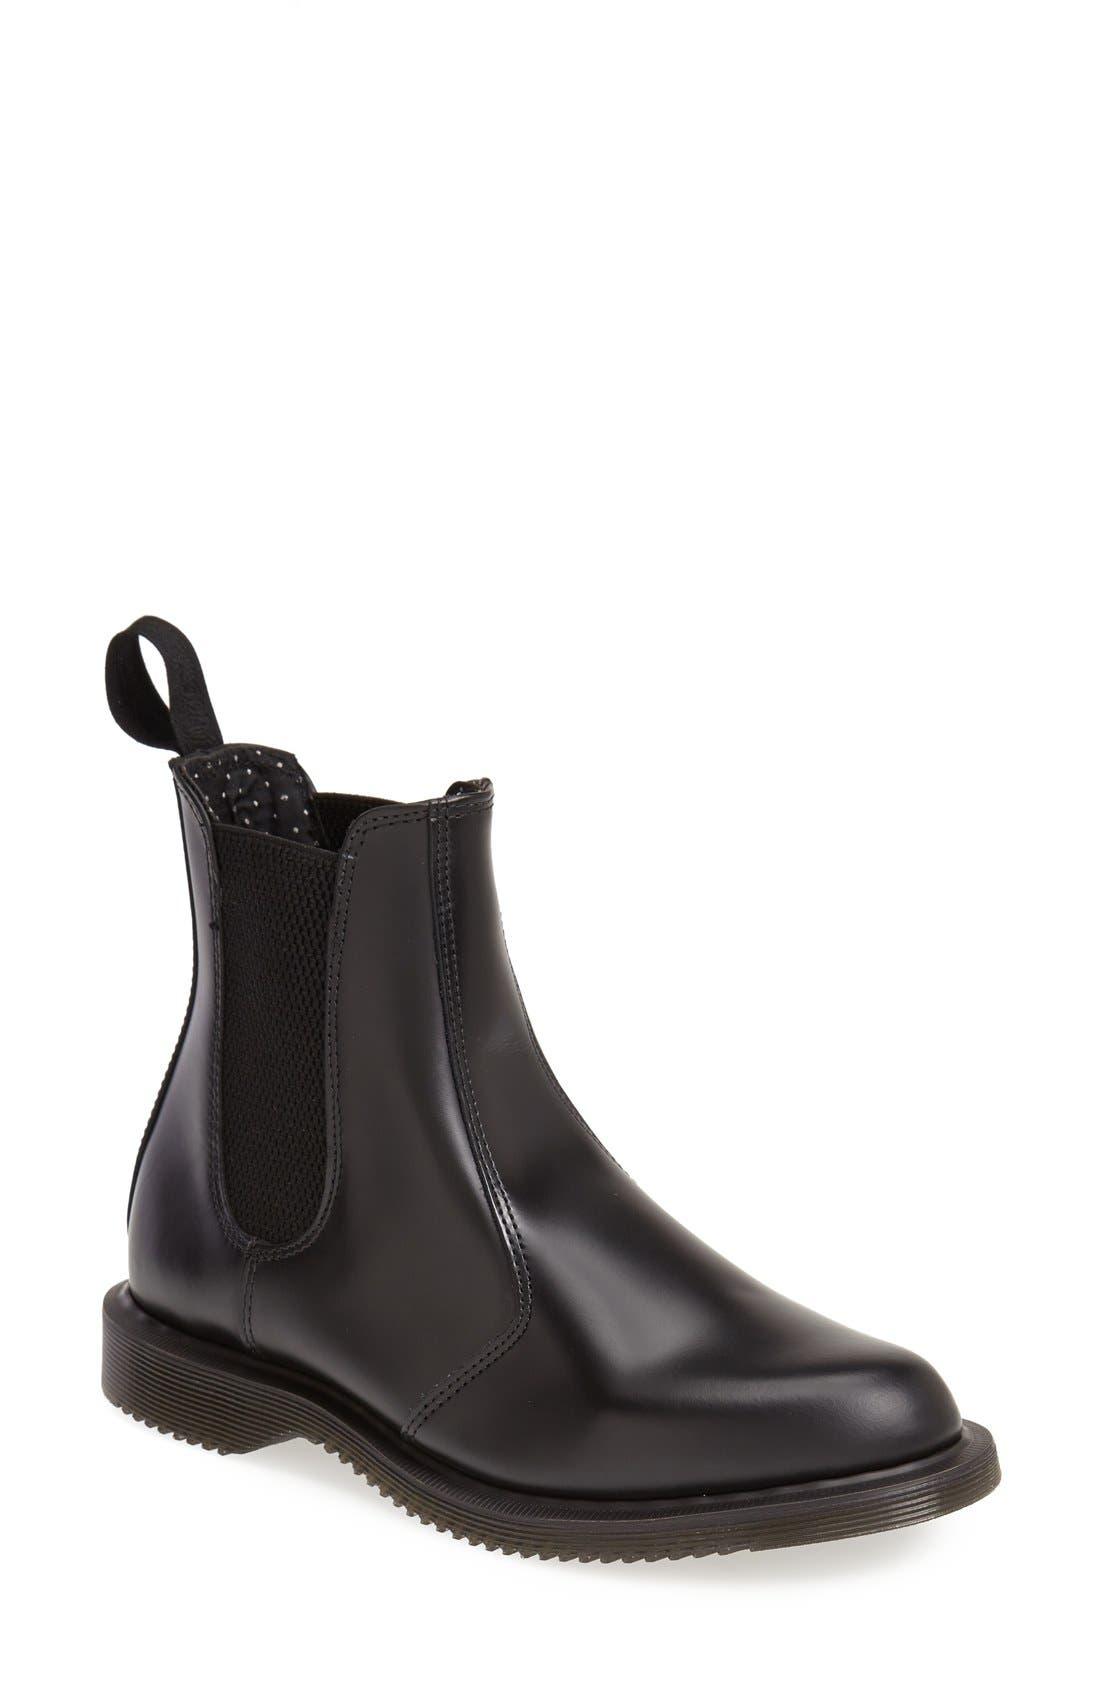 Alternate Image 1 Selected - Dr. Martens 'Flora' Chelsea Boot (Women)